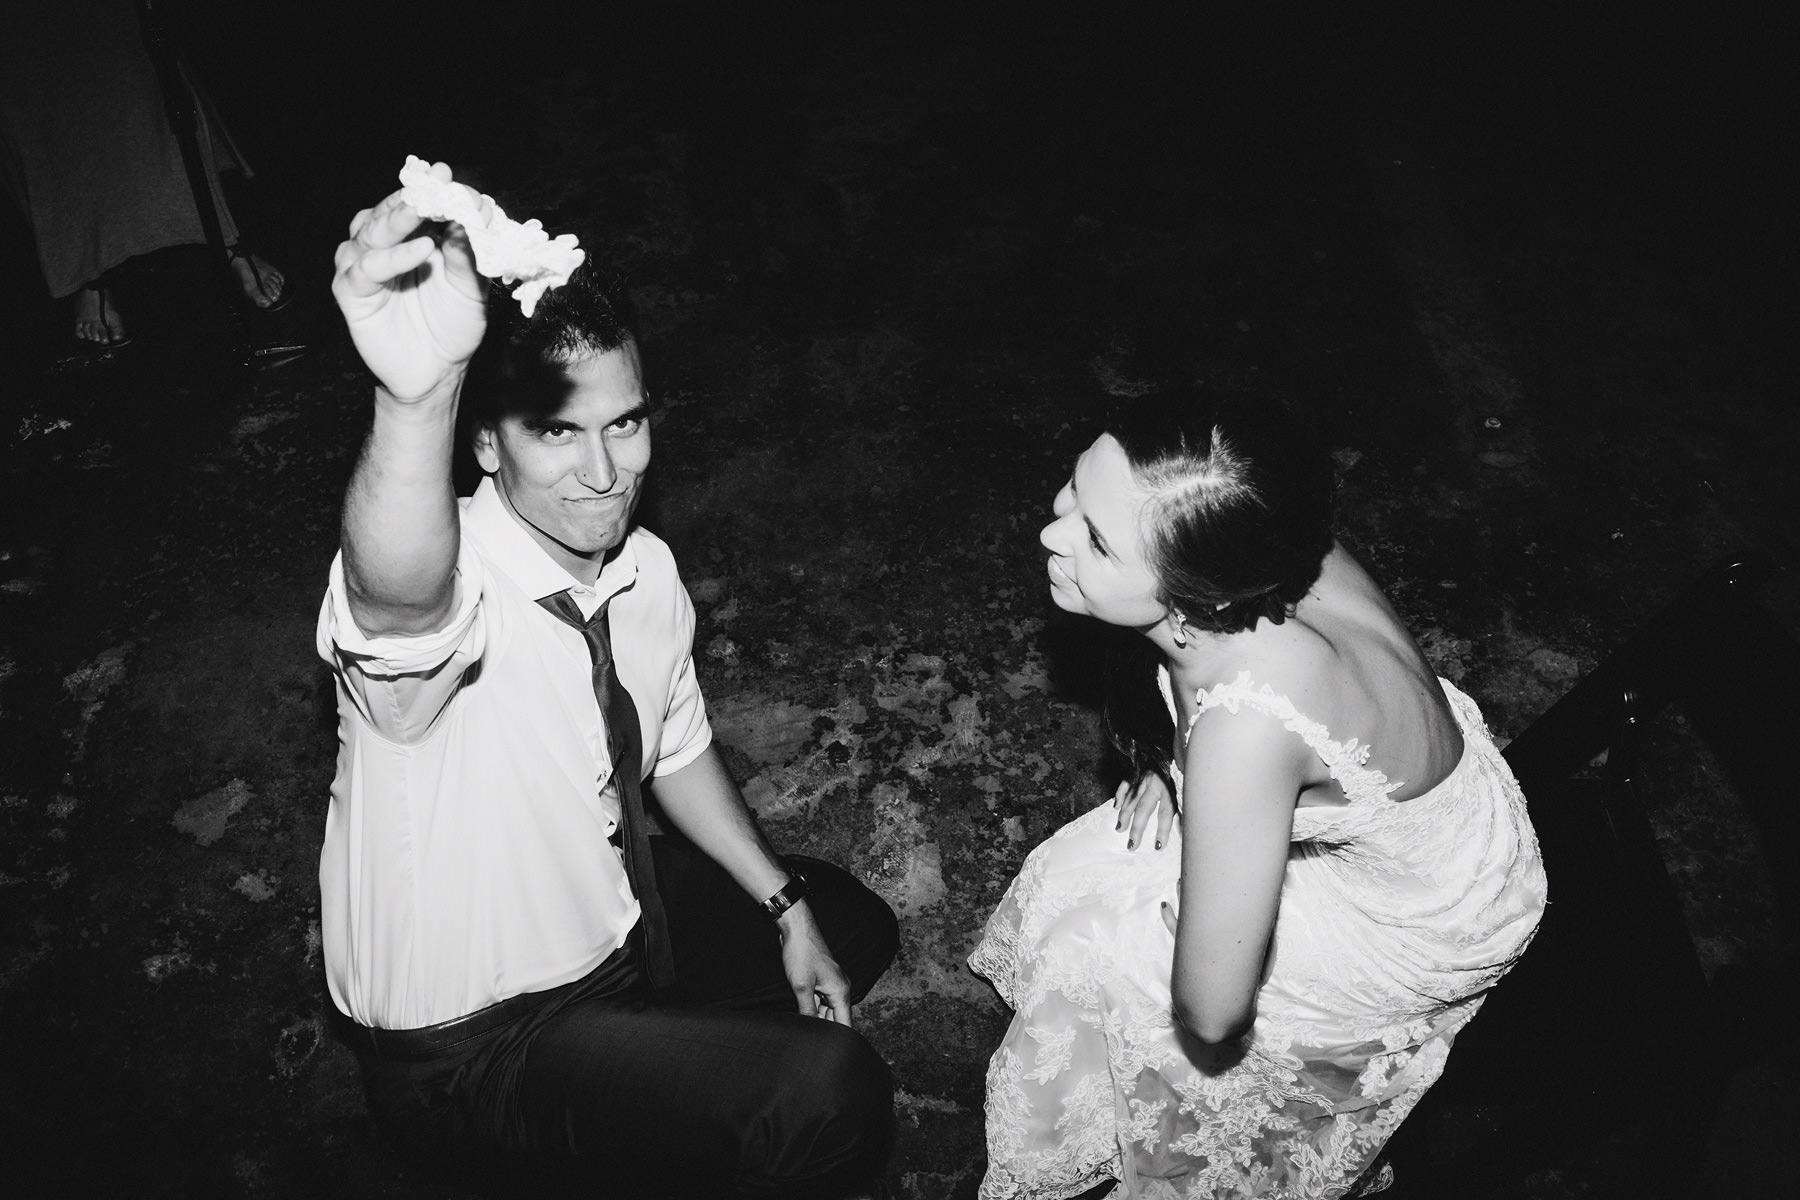 Kansas City Summer Wedding at the Guild_Kindling Wedding Photography Blog95.JPG